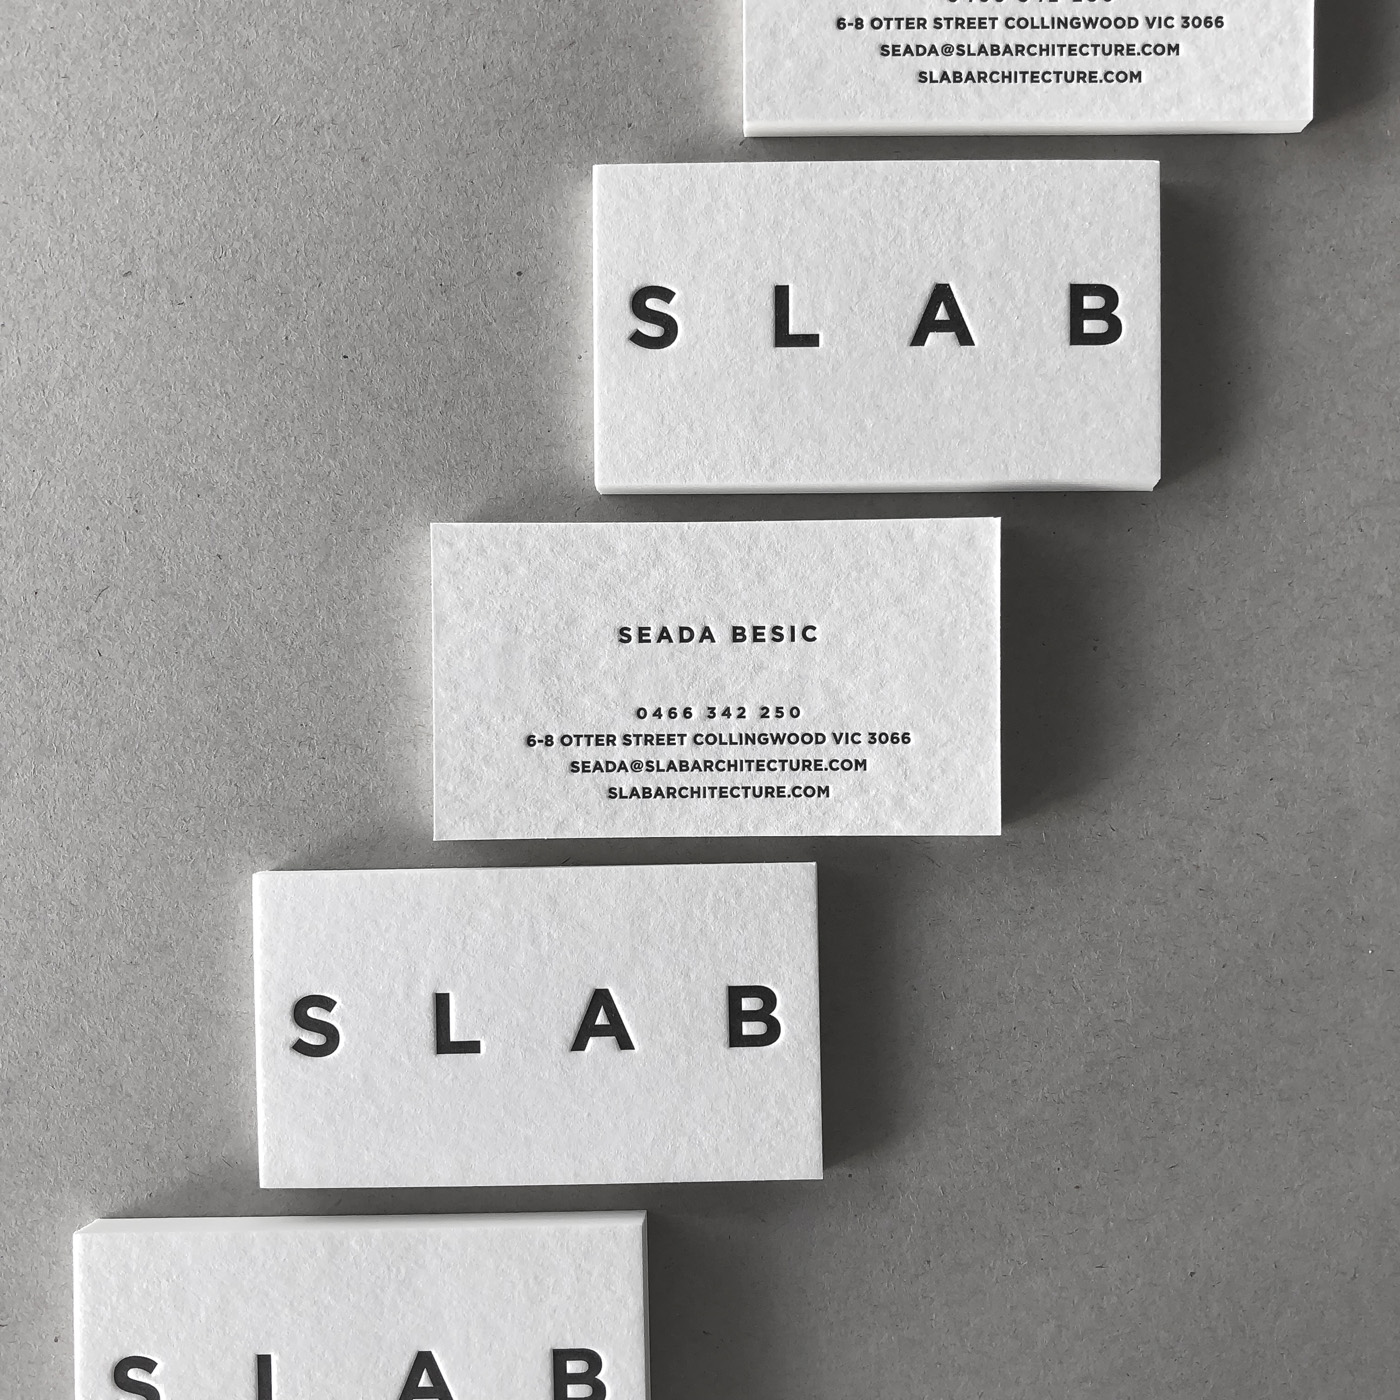 Custom letterpress business cards for Slab on Wild 2